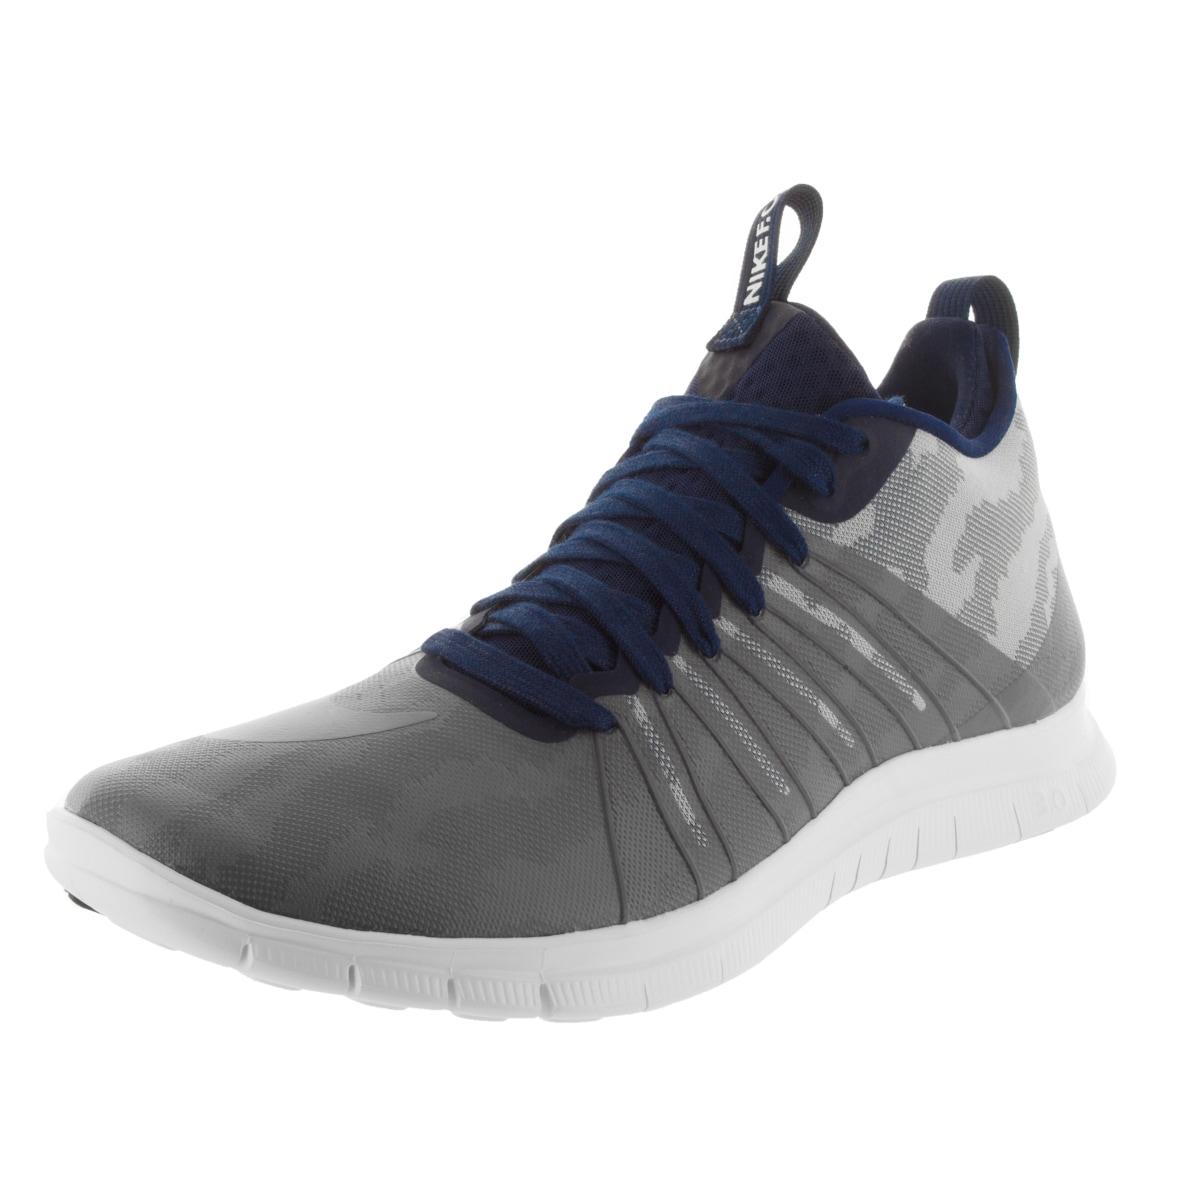 28f422617e83 Shop Nike Men s Free Hypervenom 2 Fc Flt Slvr Grey Obsdn Dark Grey Training  Shoe - Free Shipping Today - Overstock.com - 12119977